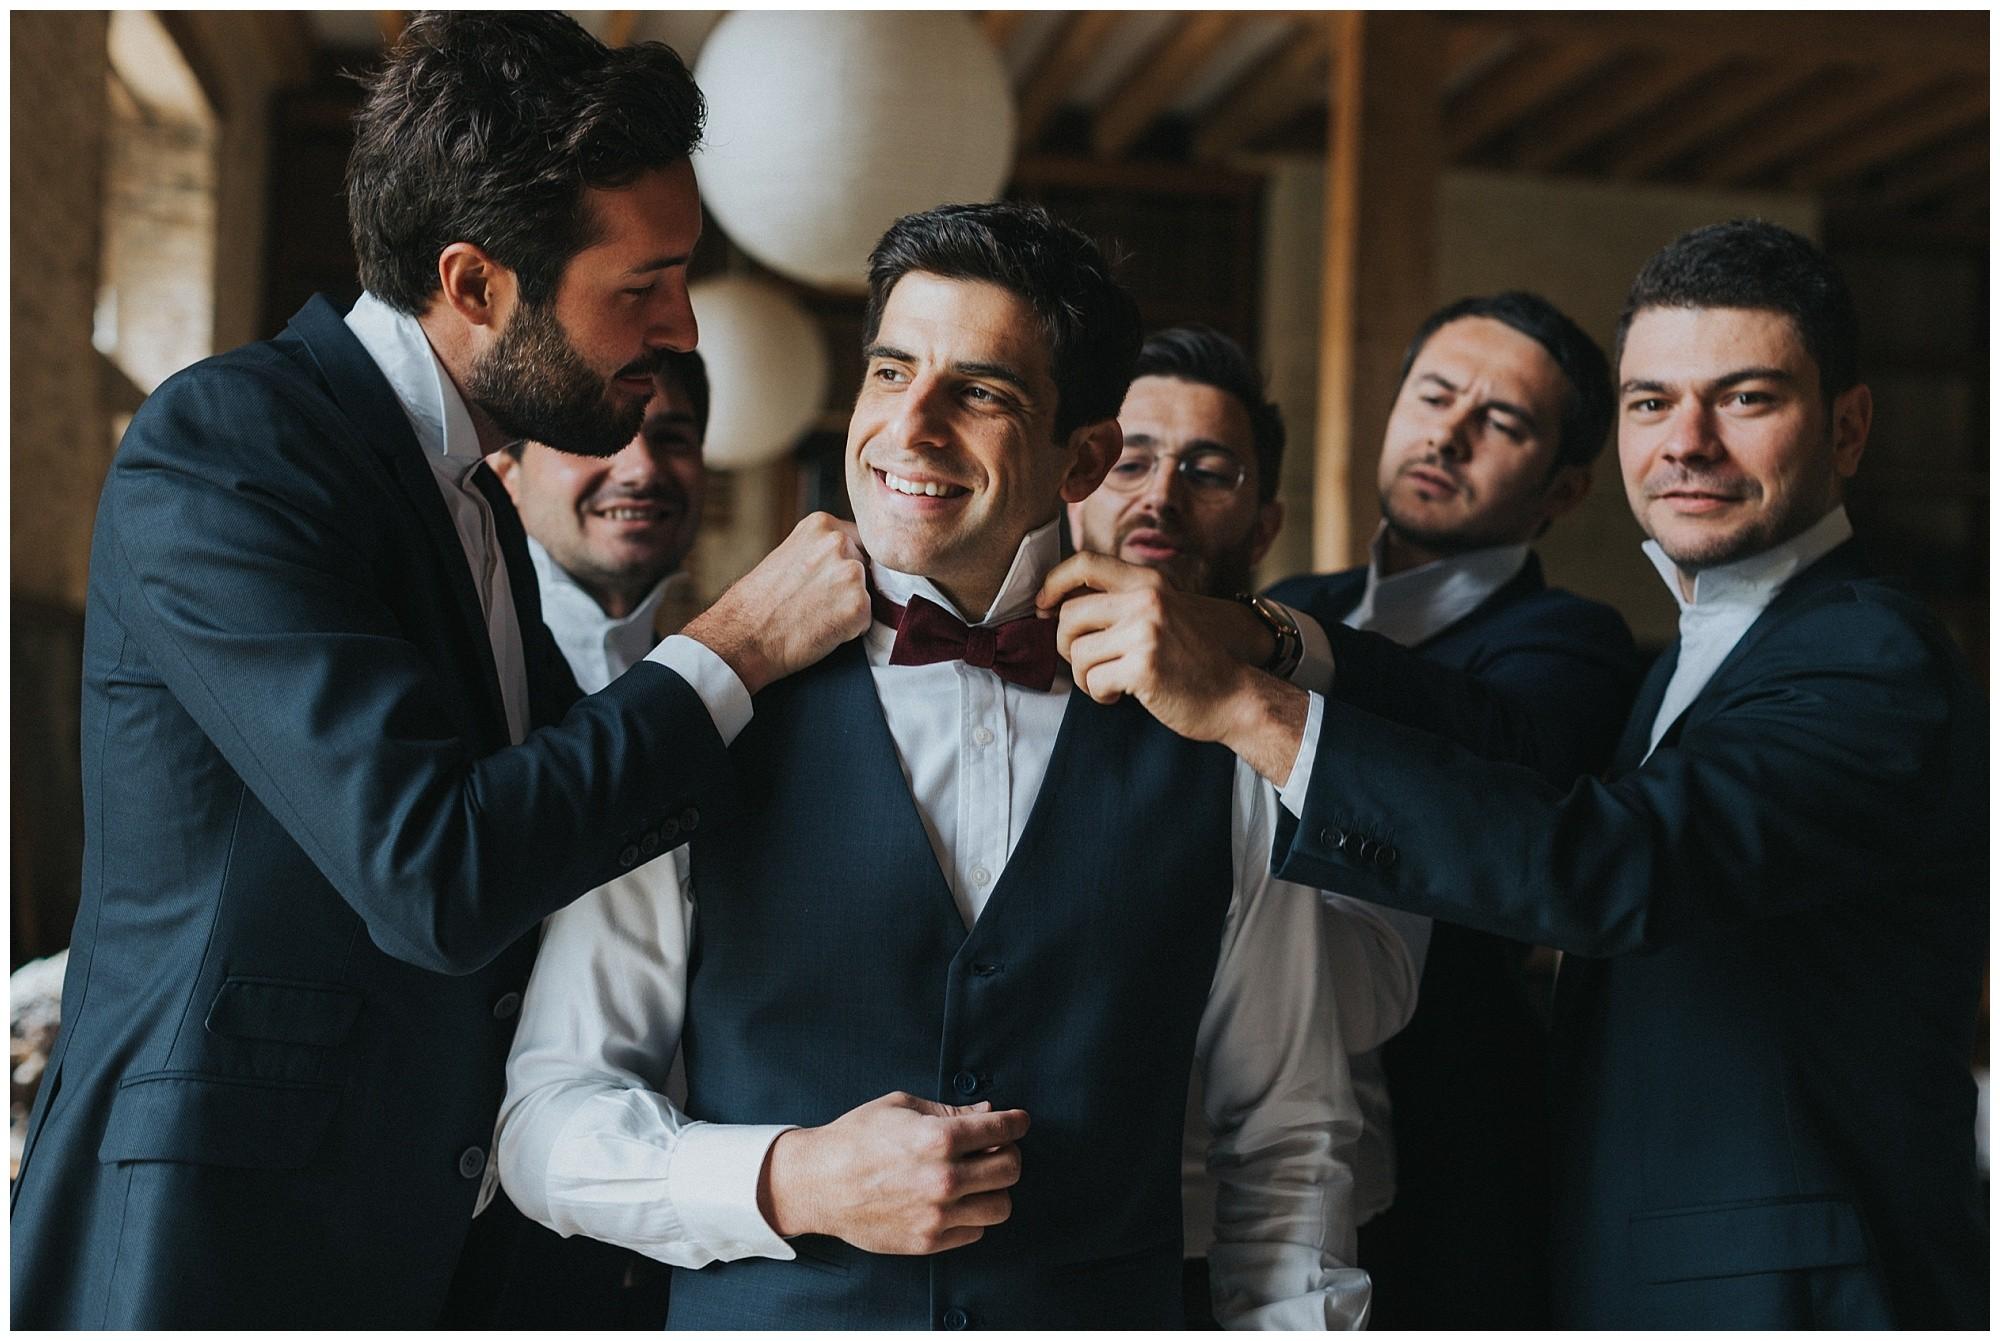 Kateryna-photos-photographer-reims-domaine-des-evis-mariage-normandie-hommes-s'habille-noeuds-pap-colonel-moutarde